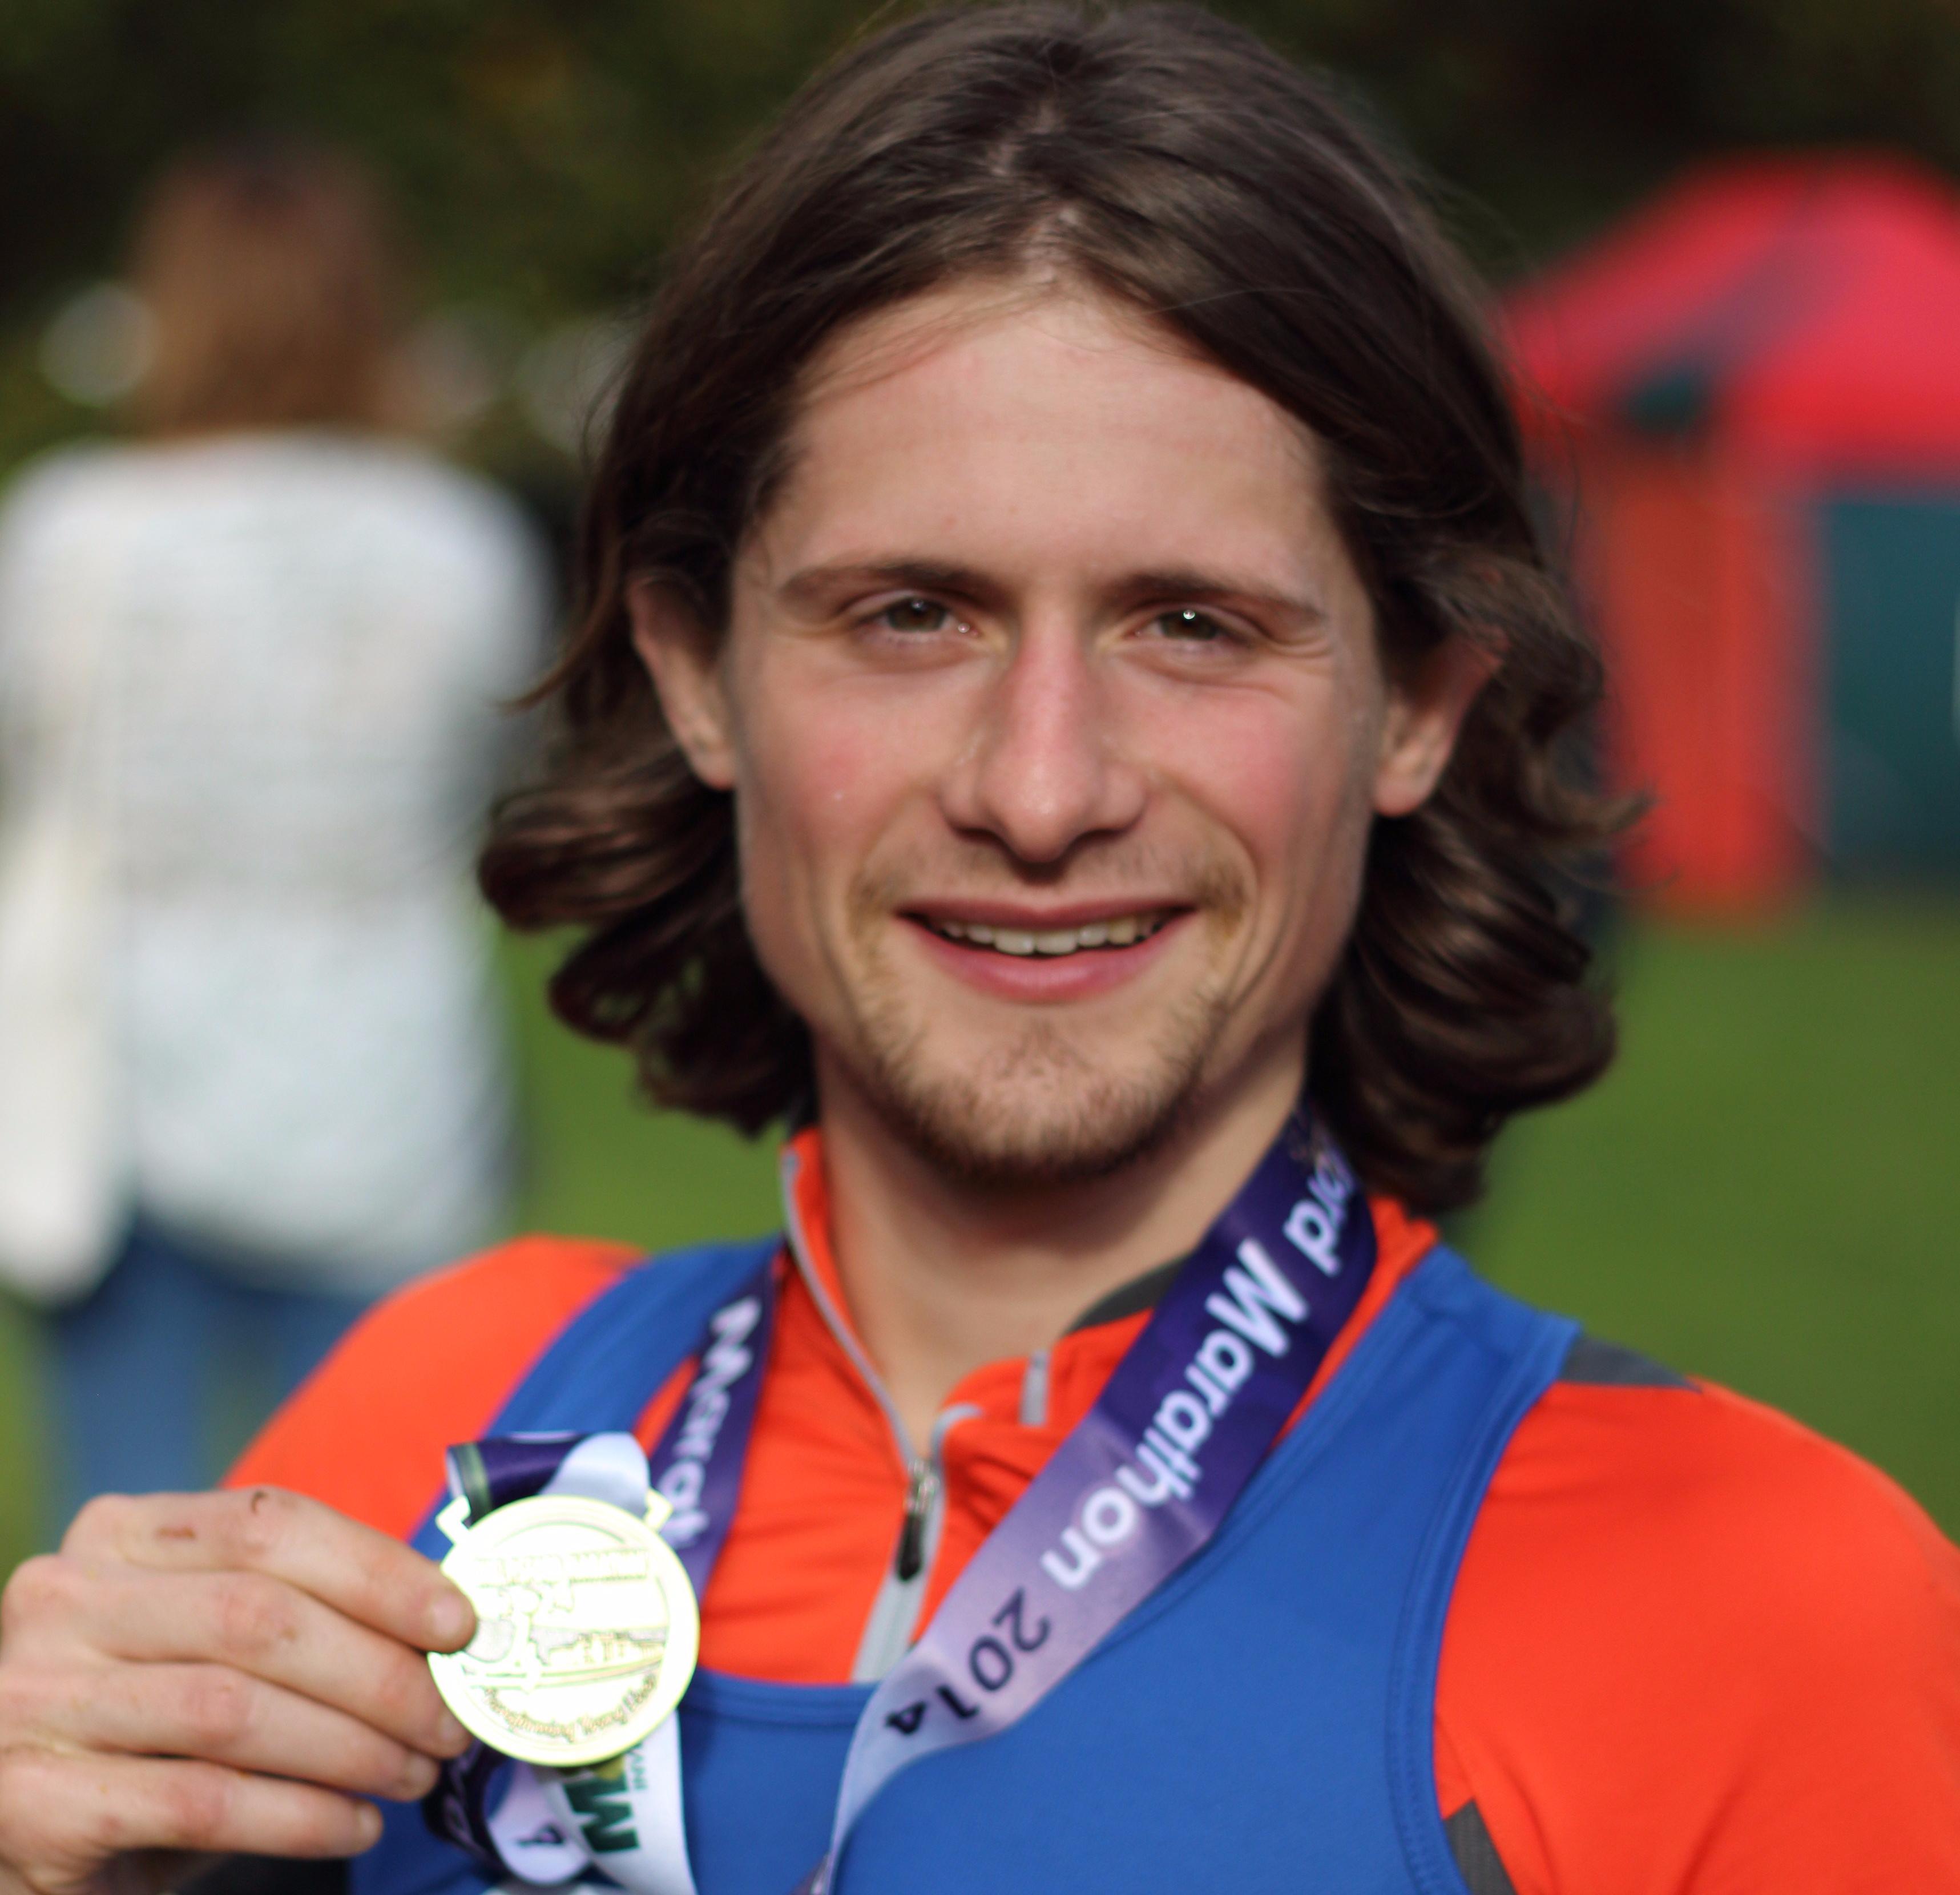 Chelmsford Marathon 2014 medal